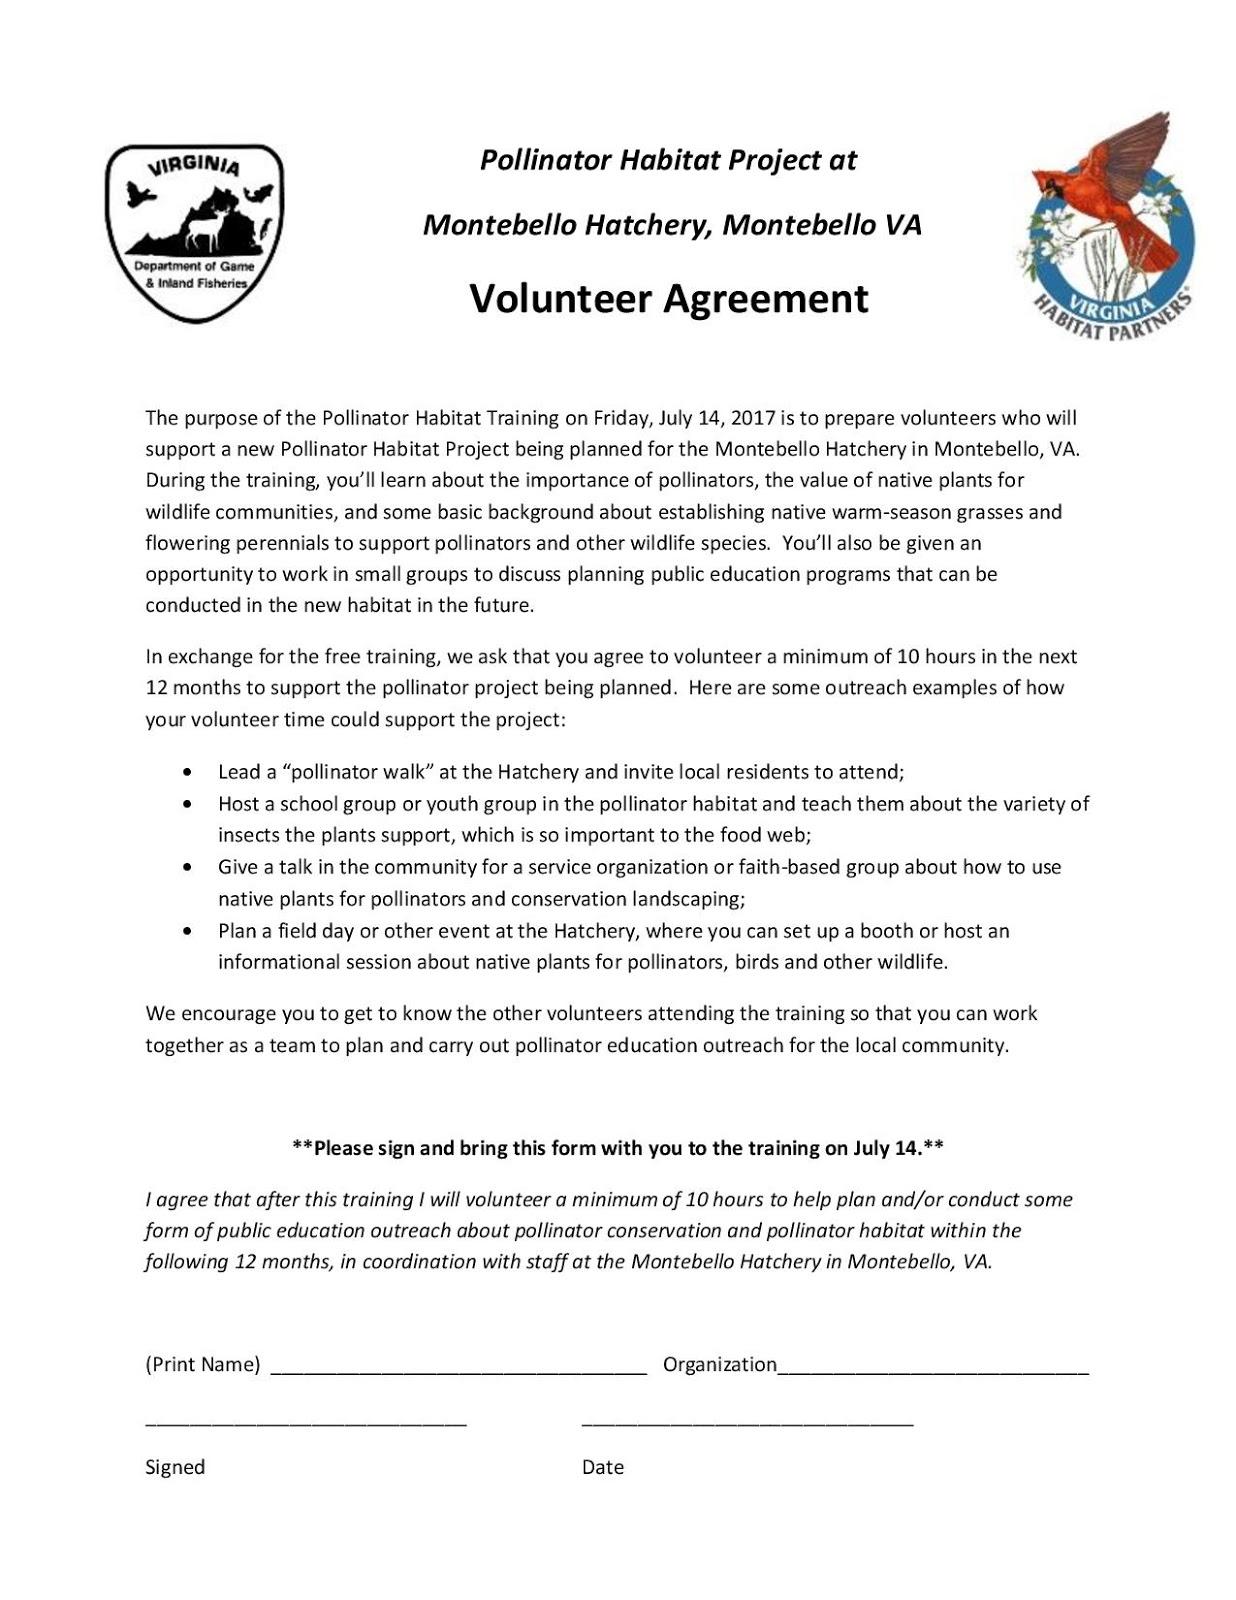 Virginia Cooperative Extension Master Gardener Program